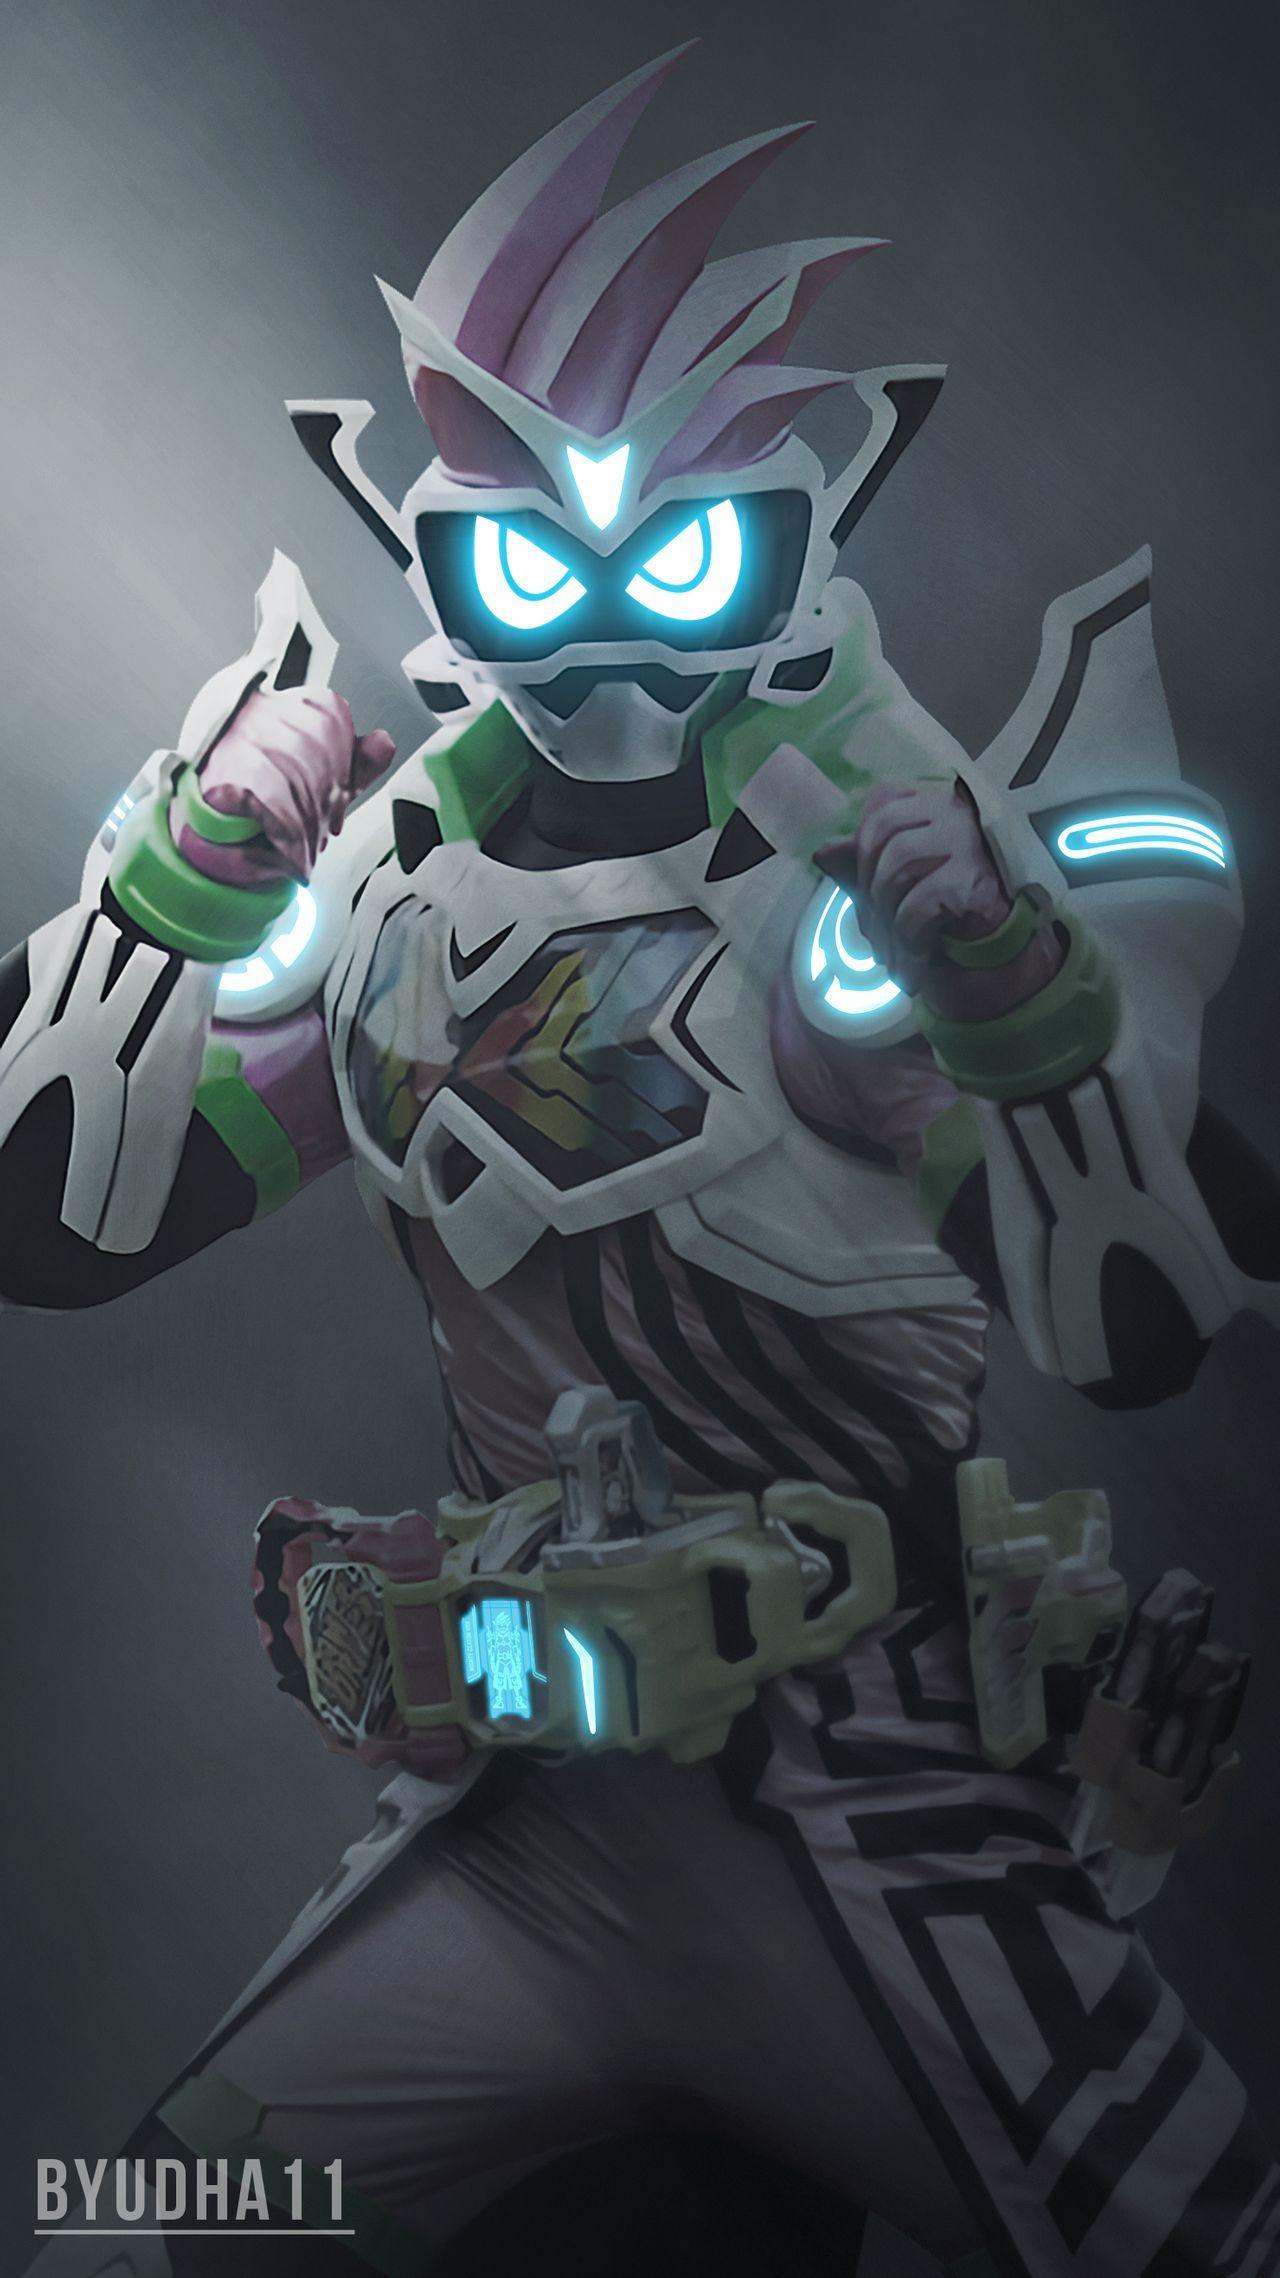 Kamen Rider Ex Aid Mighty Creator Vrx By Byudha11 On Deviantart Lukisan Keluarga Pahlawan Super Seni